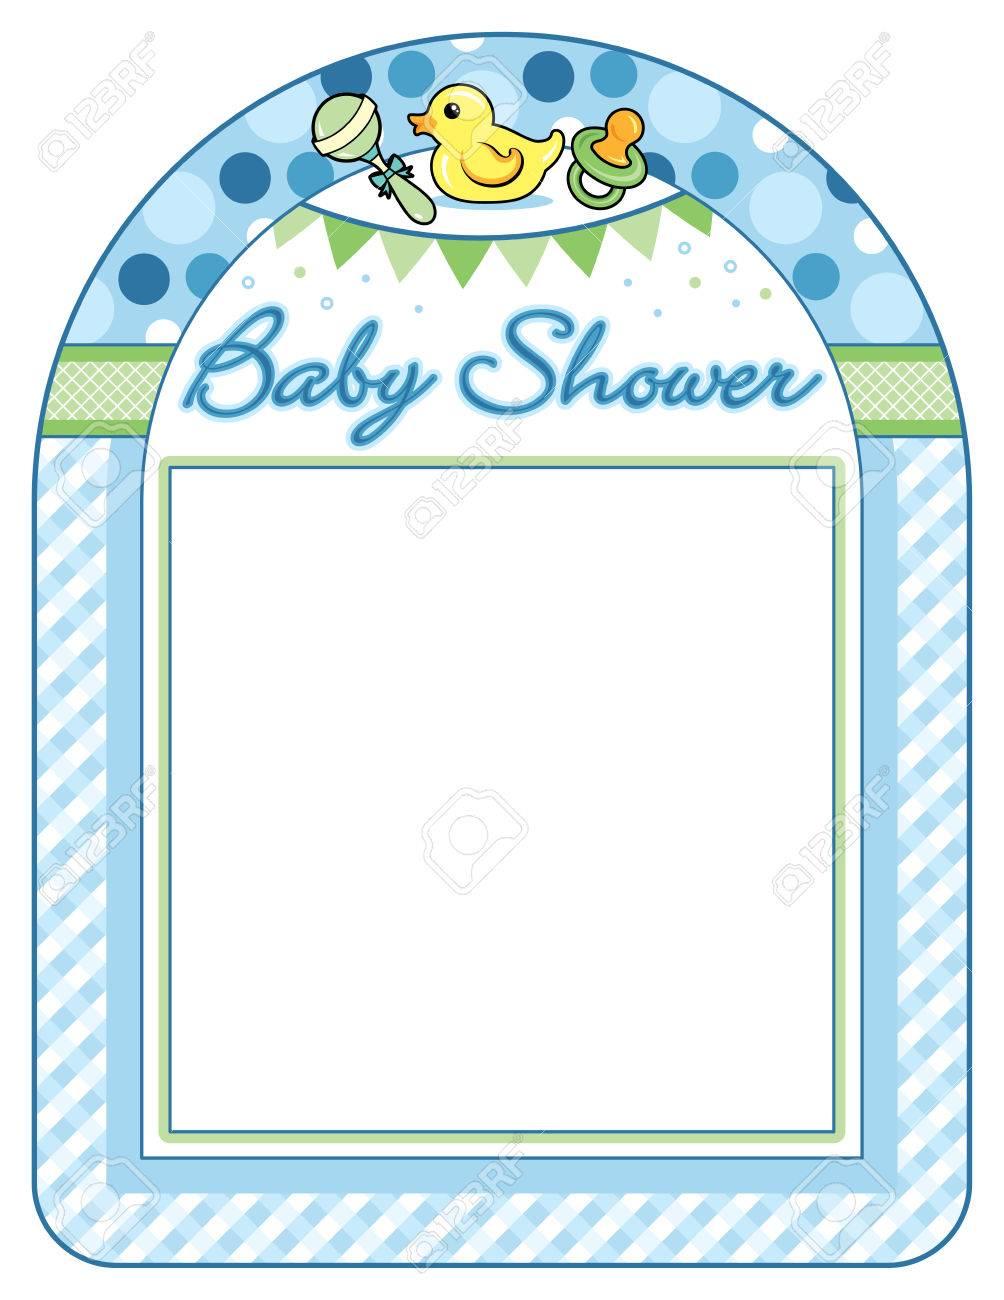 Baby Shower Frame Boy : shower, frame, Shower, Frame, Print, Sheet, Royalty, Cliparts,, Vectors,, Stock, Illustration., Image, 58633038.